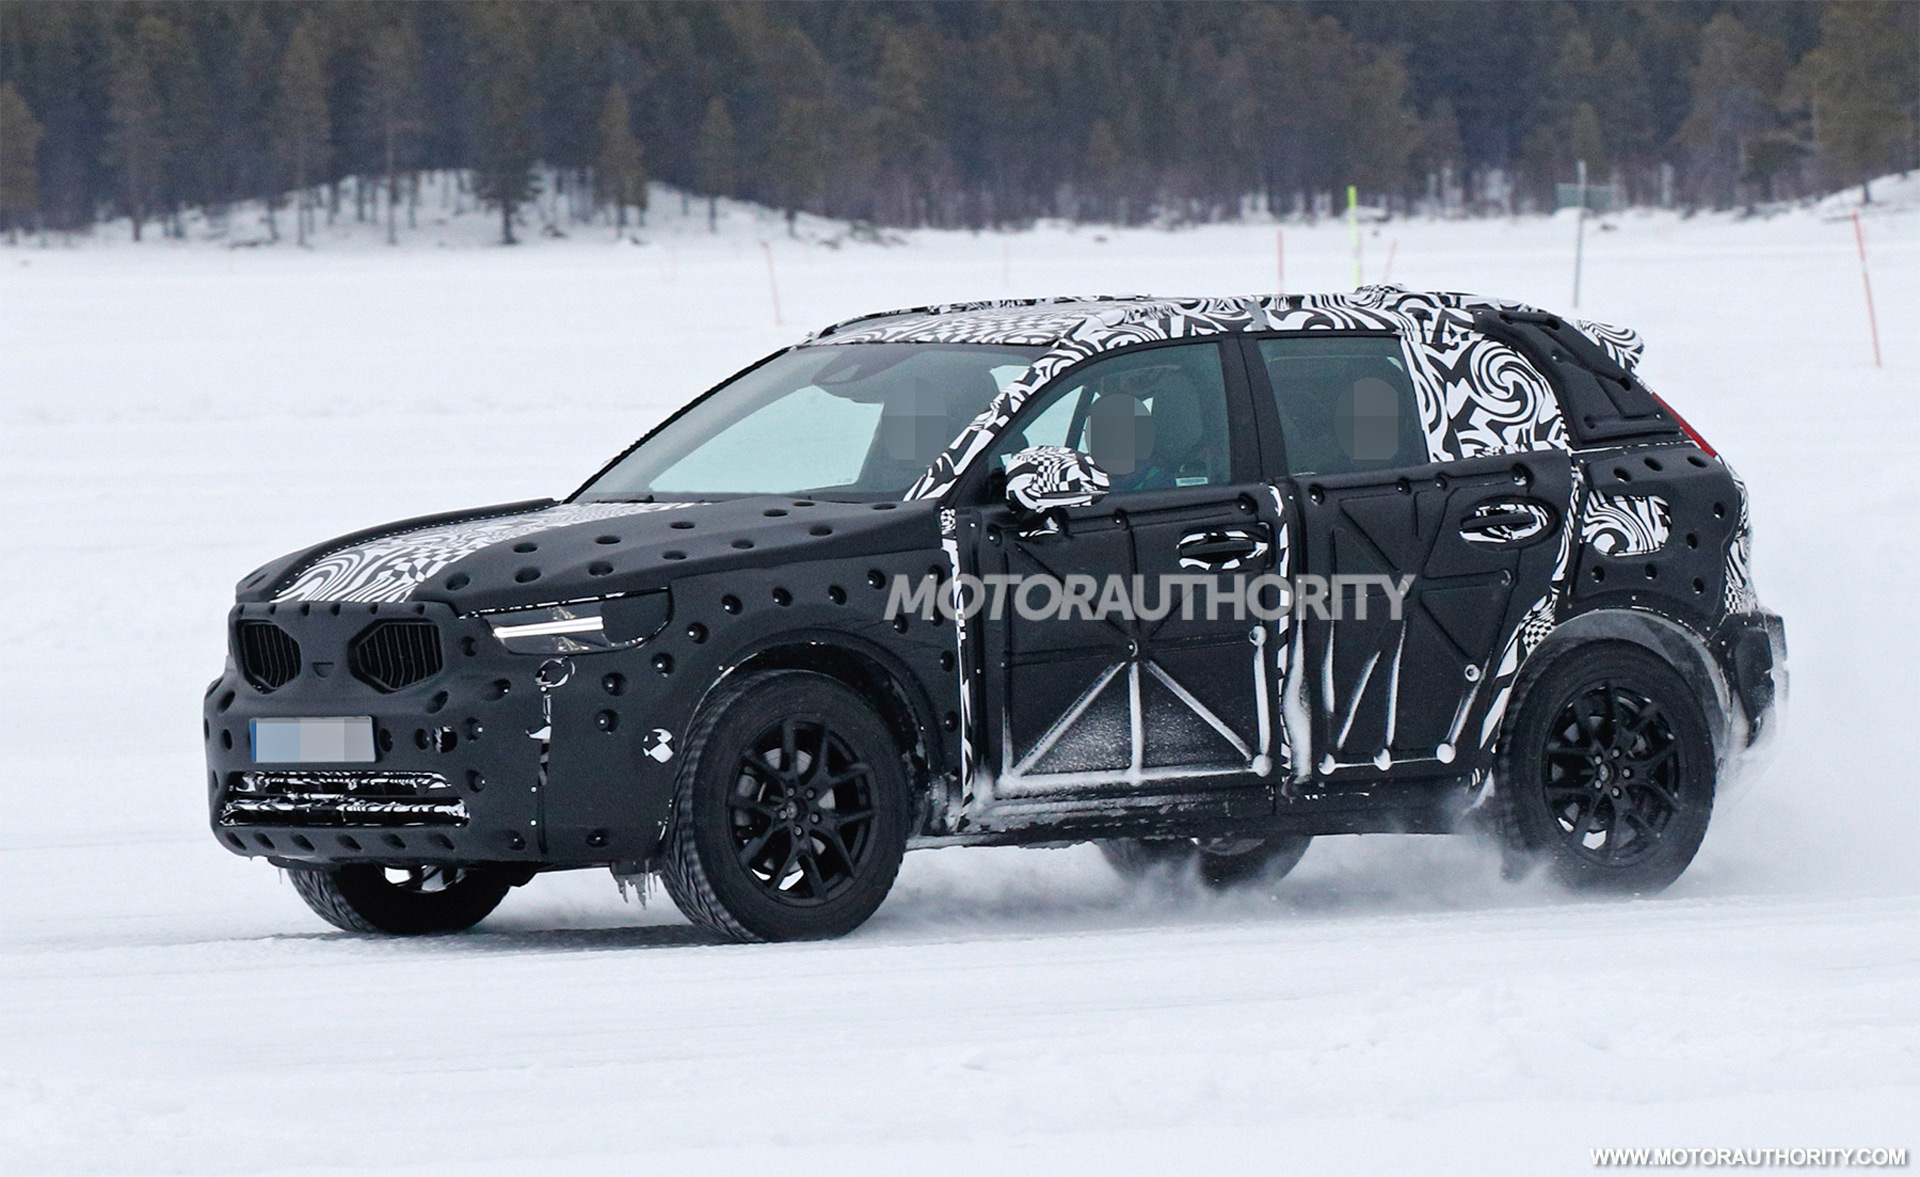 Dodge Durango SRT, Jeep Wrangler diesel, Volvo XC40: Car News Headlines